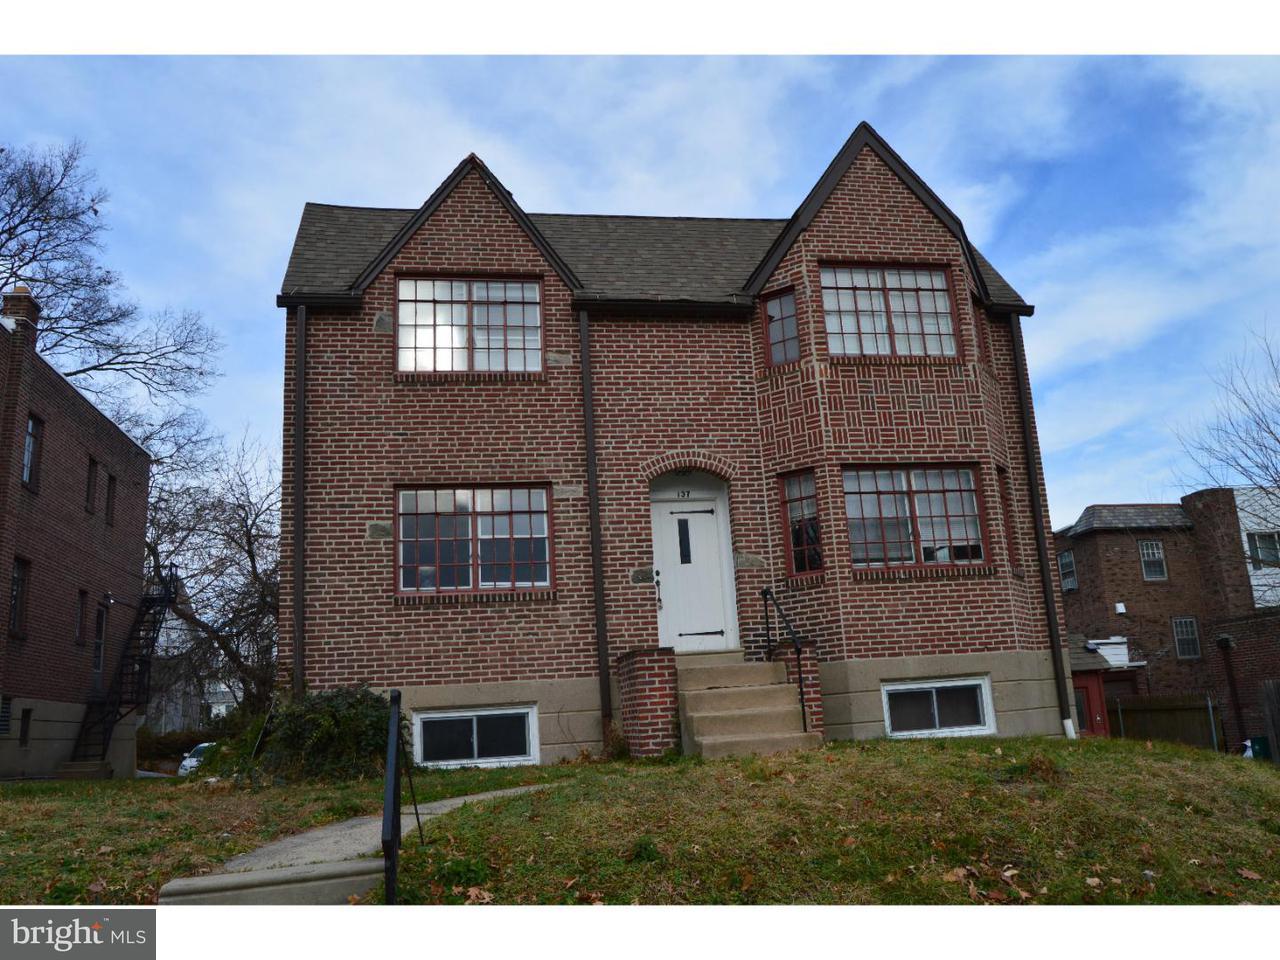 Quadraplex 为 出租 在 137 BERKLEY AVE #B Lansdowne, 宾夕法尼亚州 19050 美国